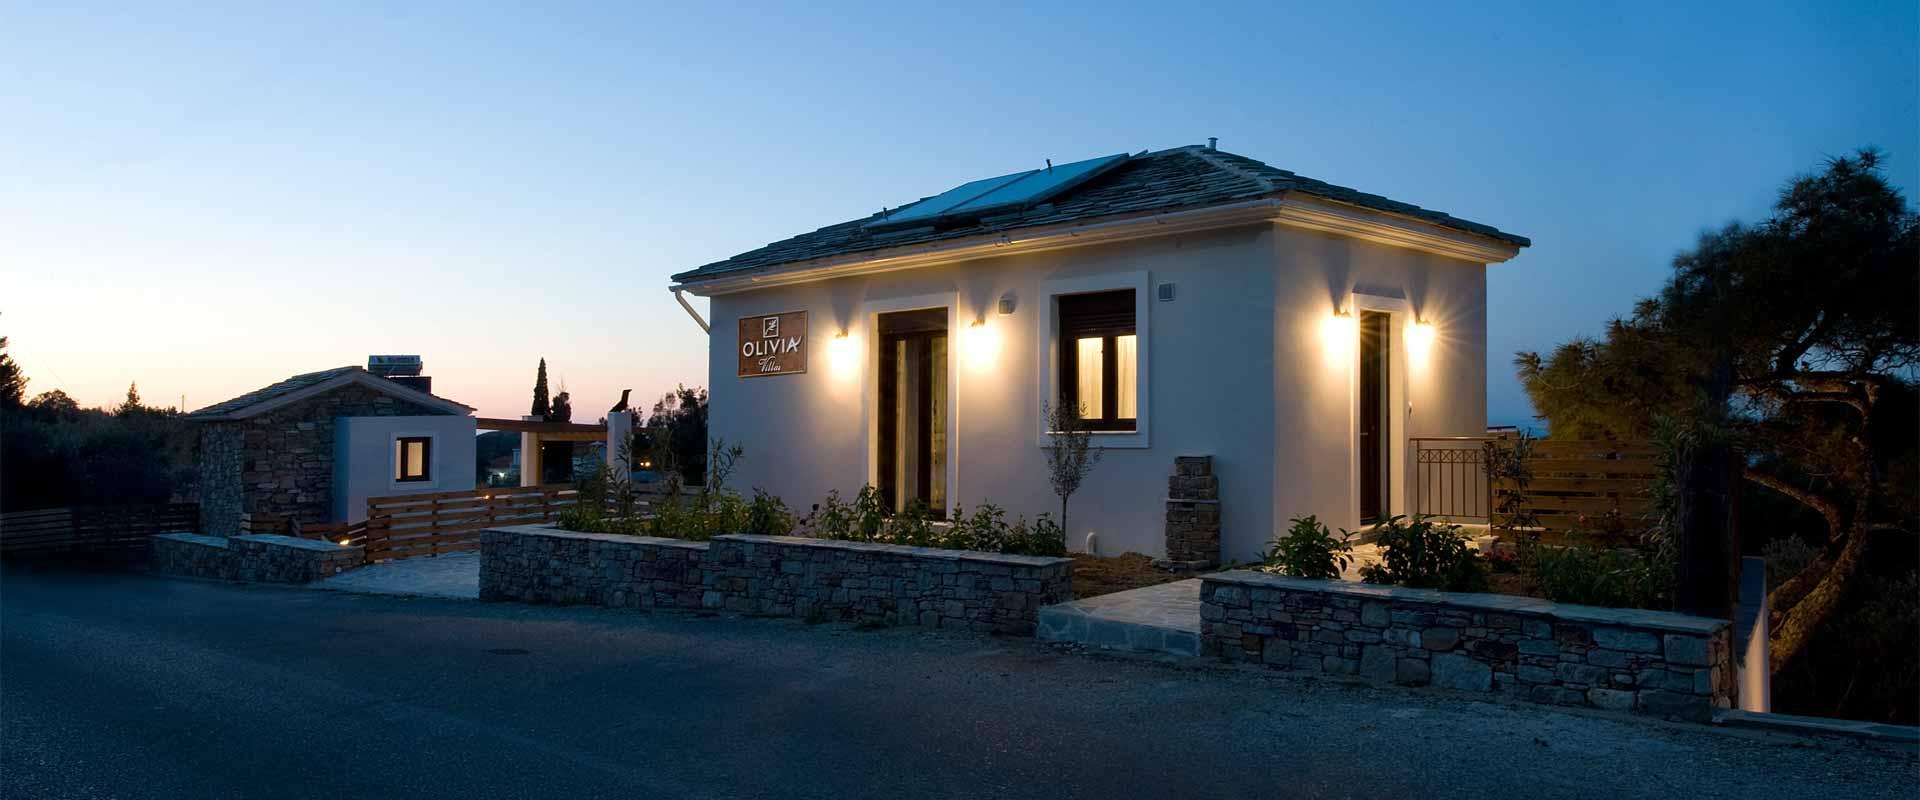 ikaria olivia villas night street view image